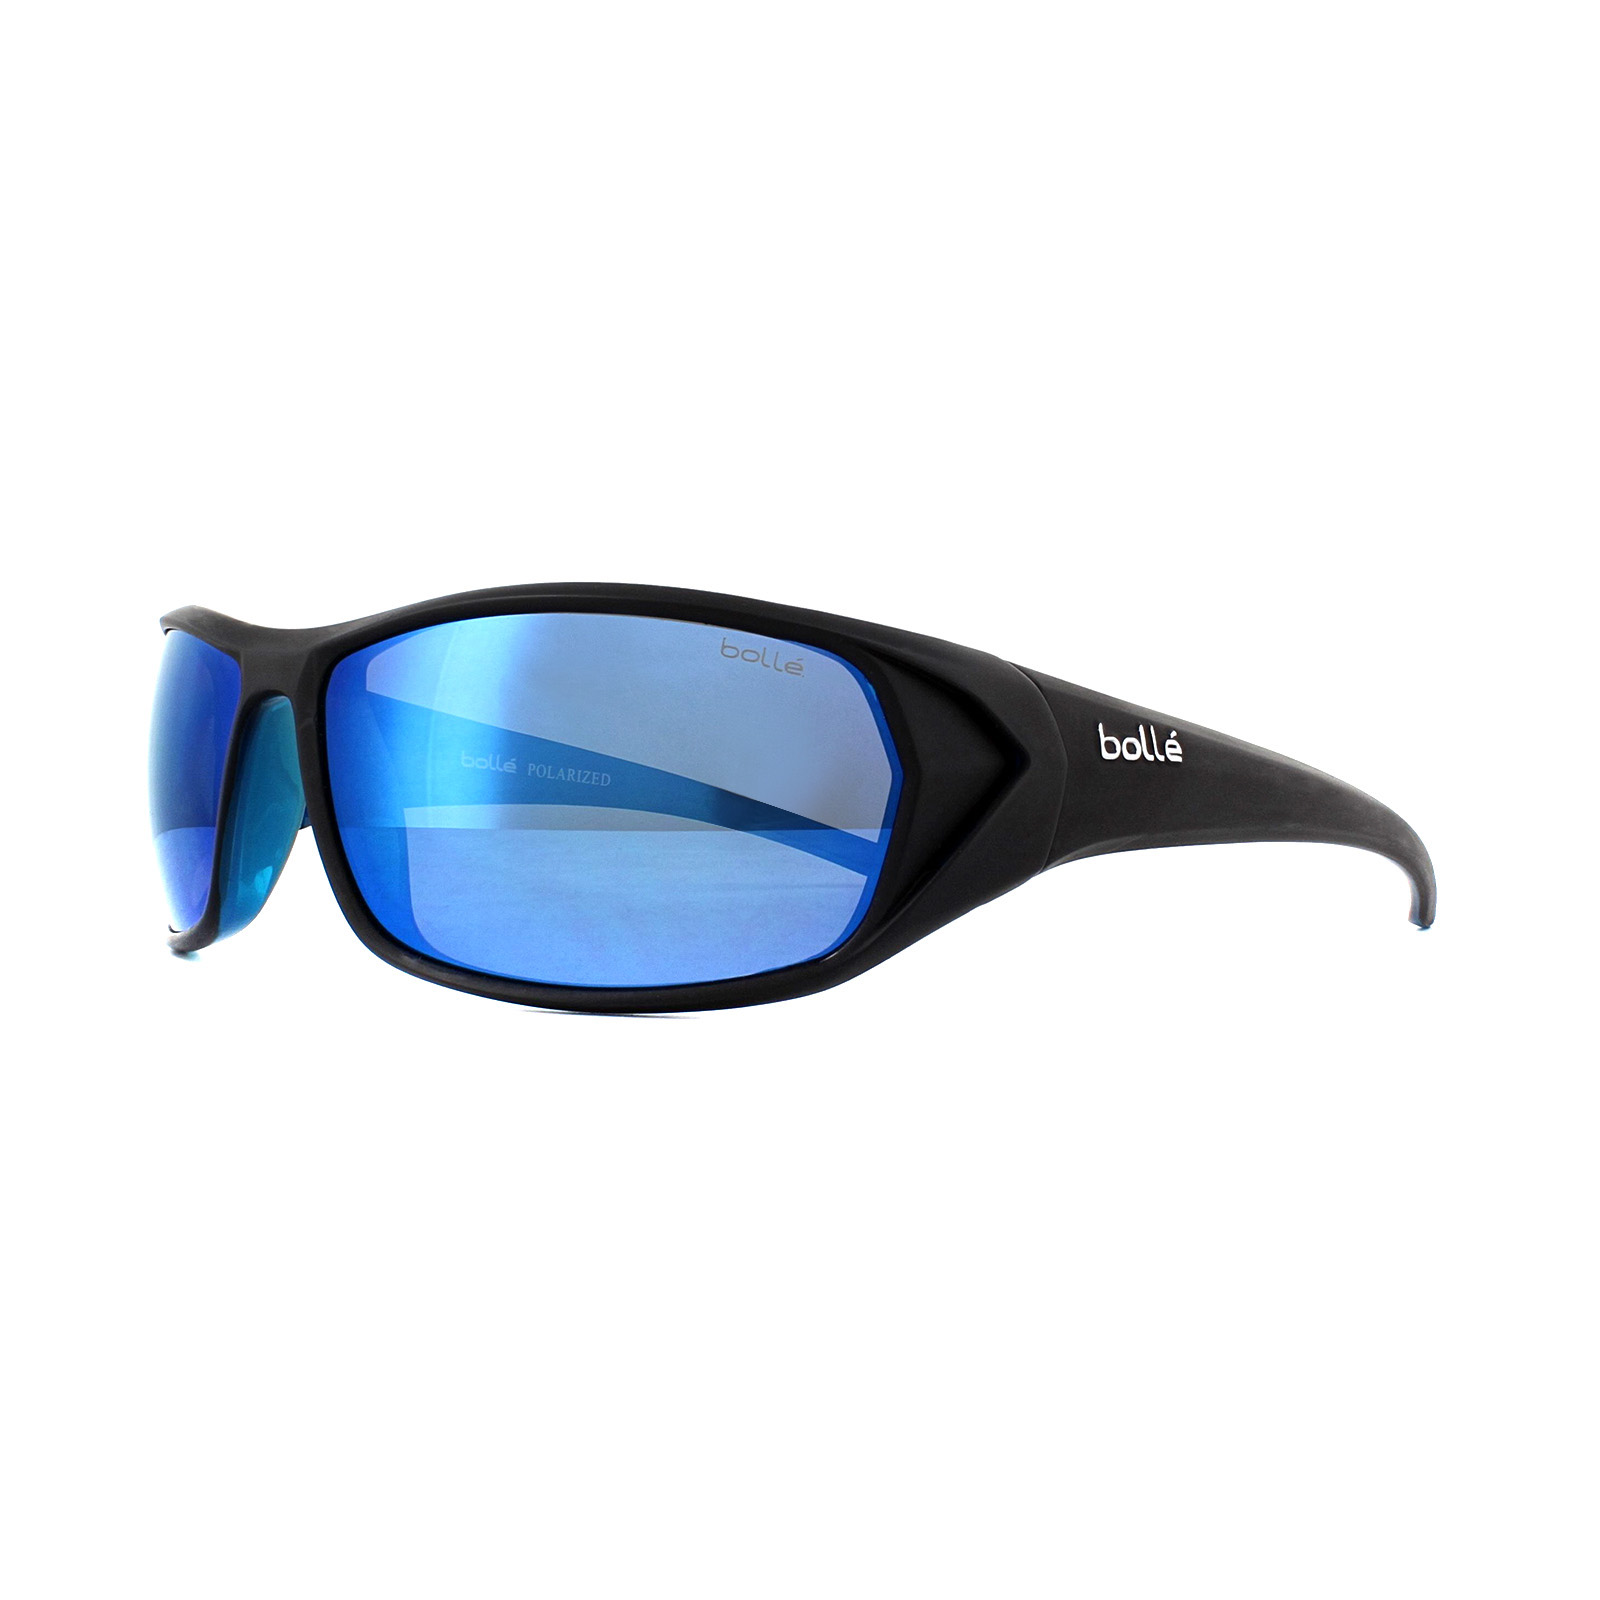 1828cd1534 Sentinel Bolle Sunglasses Blacktail 12031 Shiny Black Blue Offshore Blue  Polarized